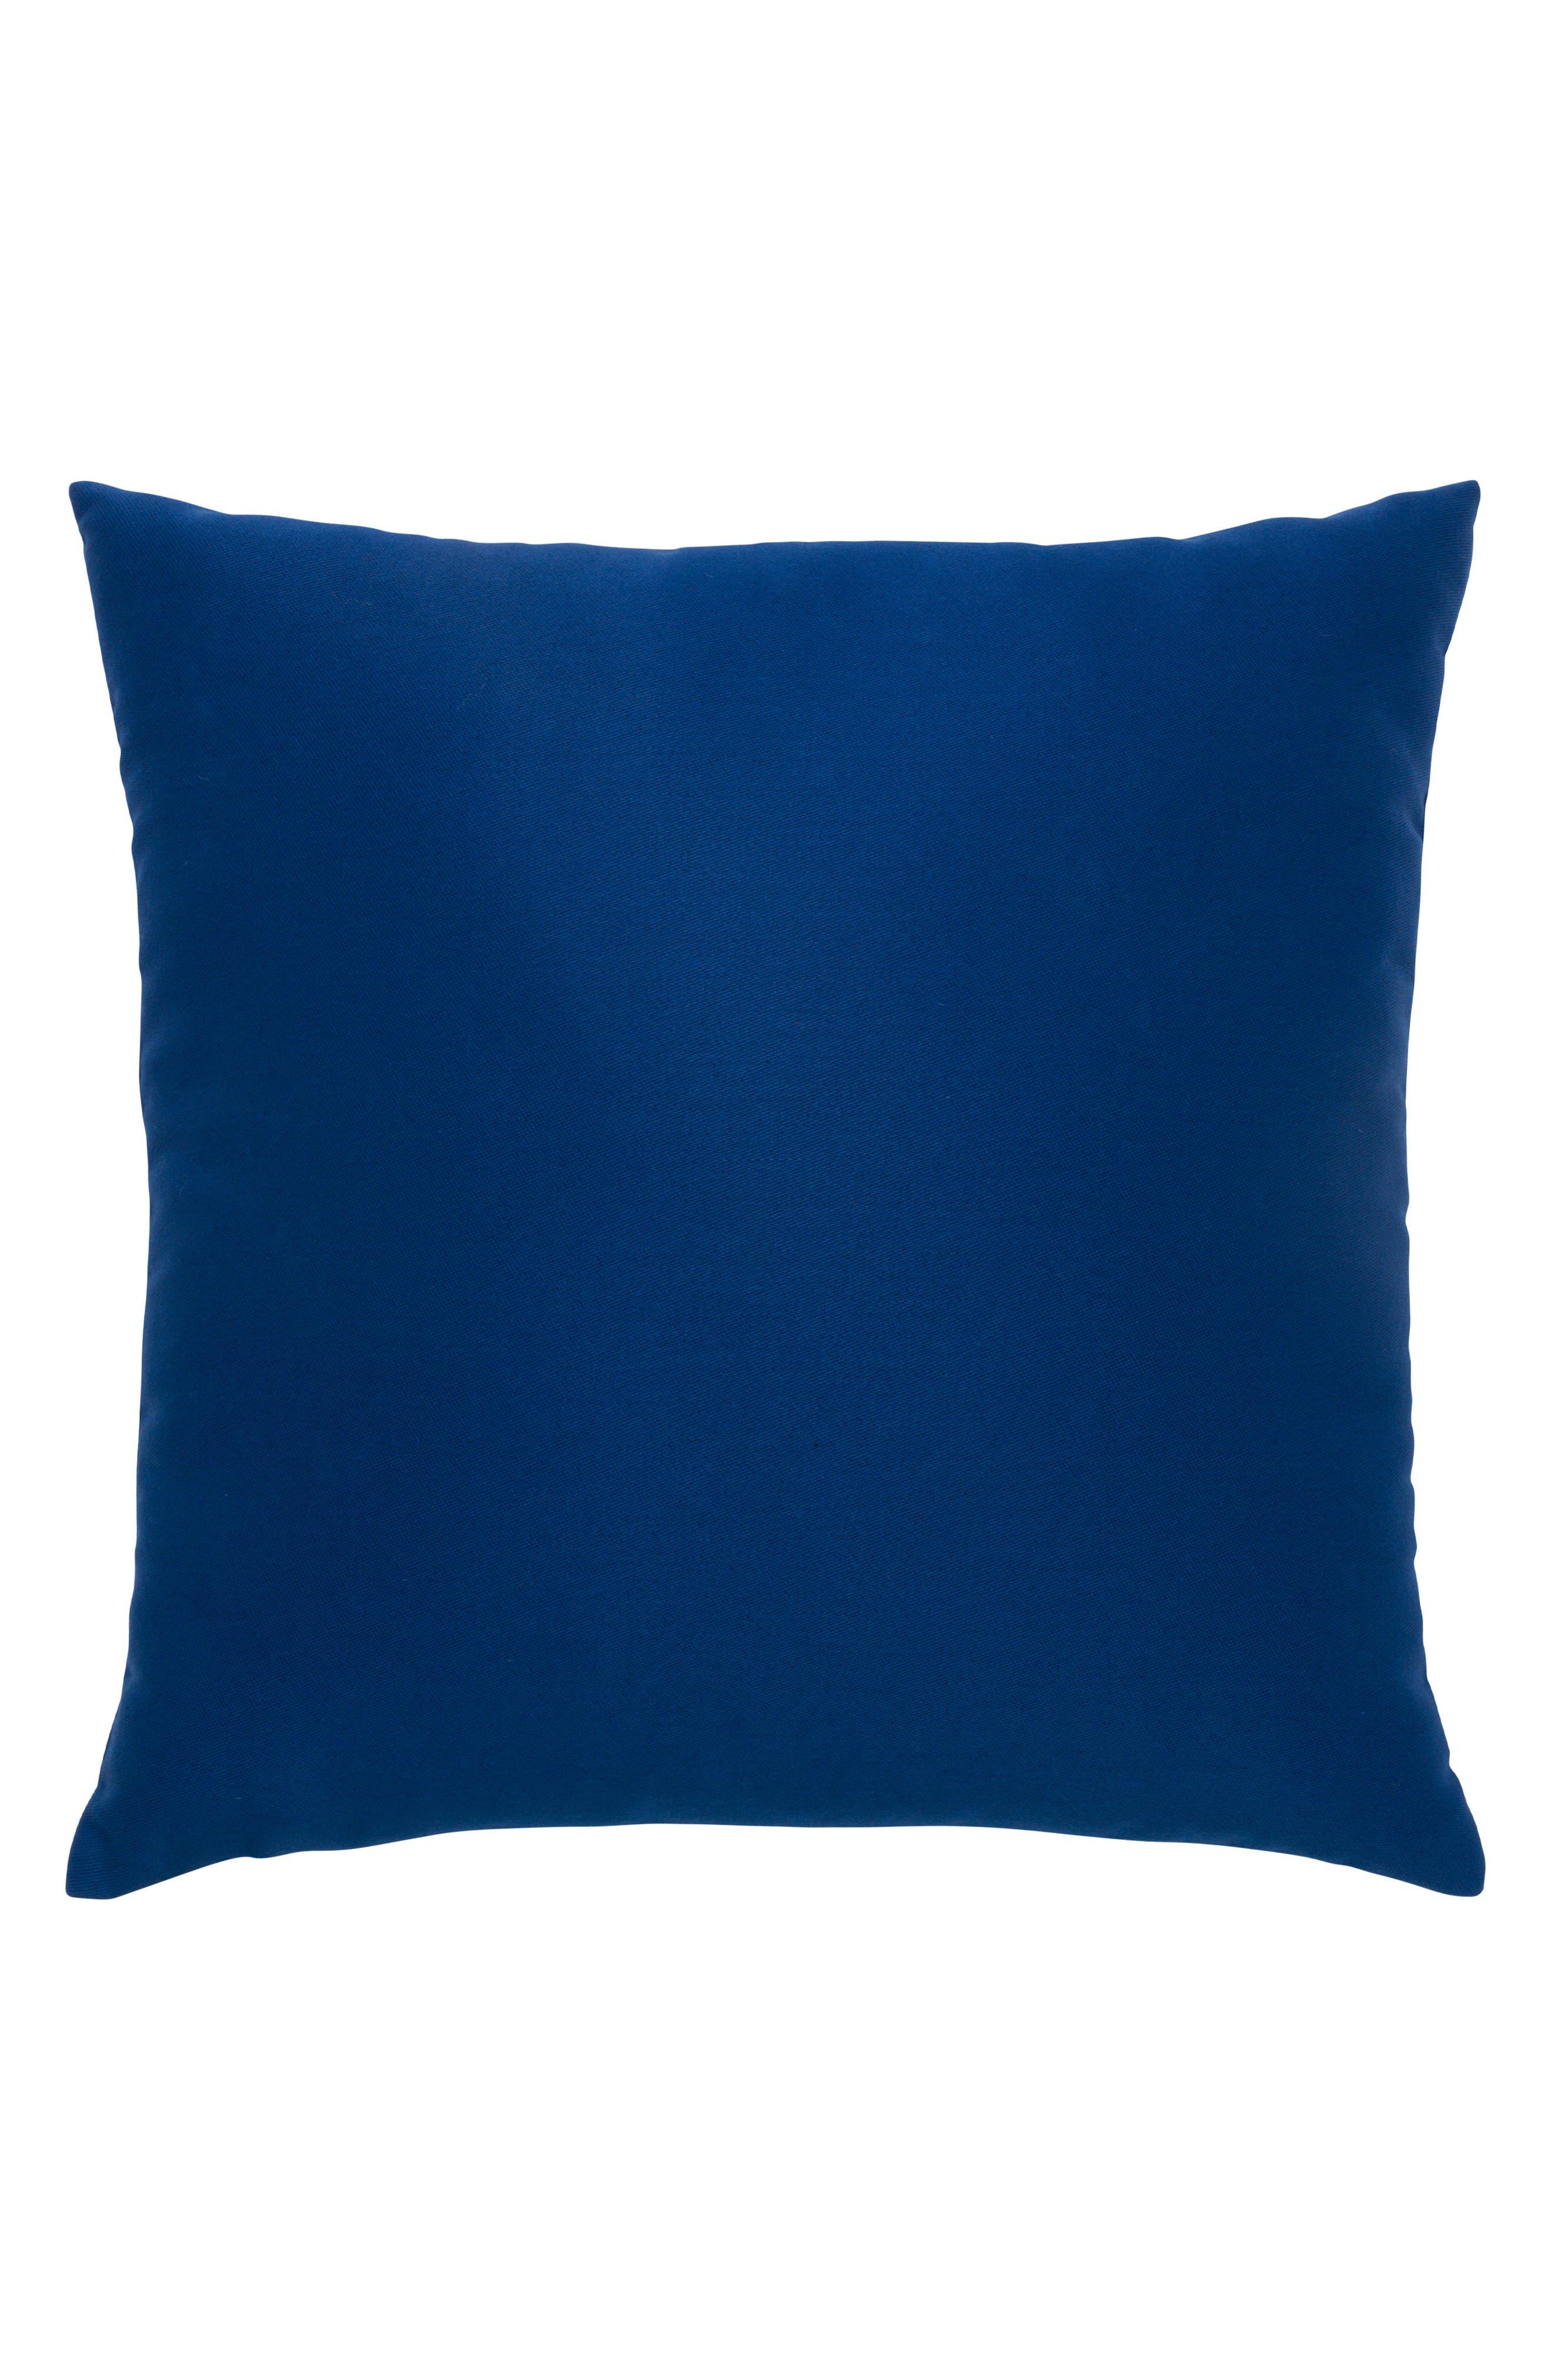 Ombré Azure Indoor/Outdoor Accent Pillow,                             Alternate thumbnail 3, color,                             Blue